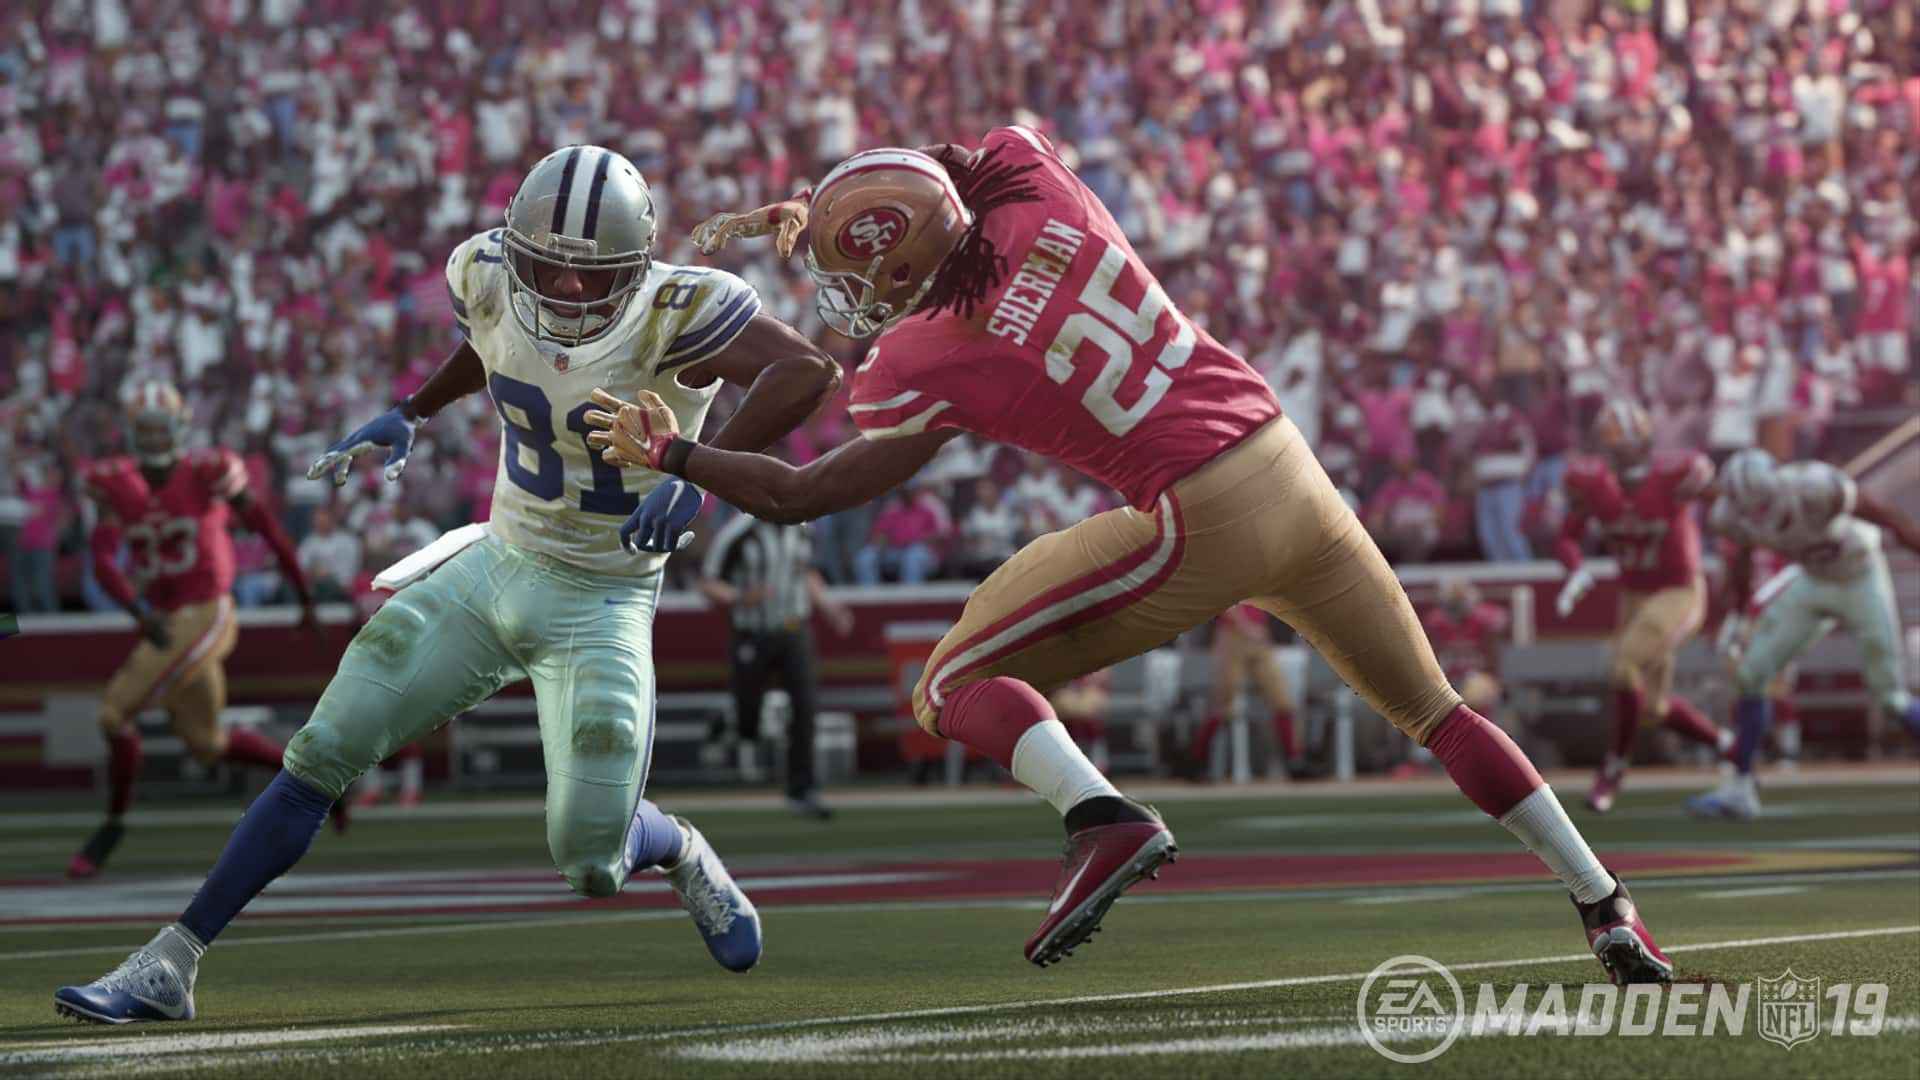 Madden NFL 19 Graphics Deep Dive Sports Gamers Online